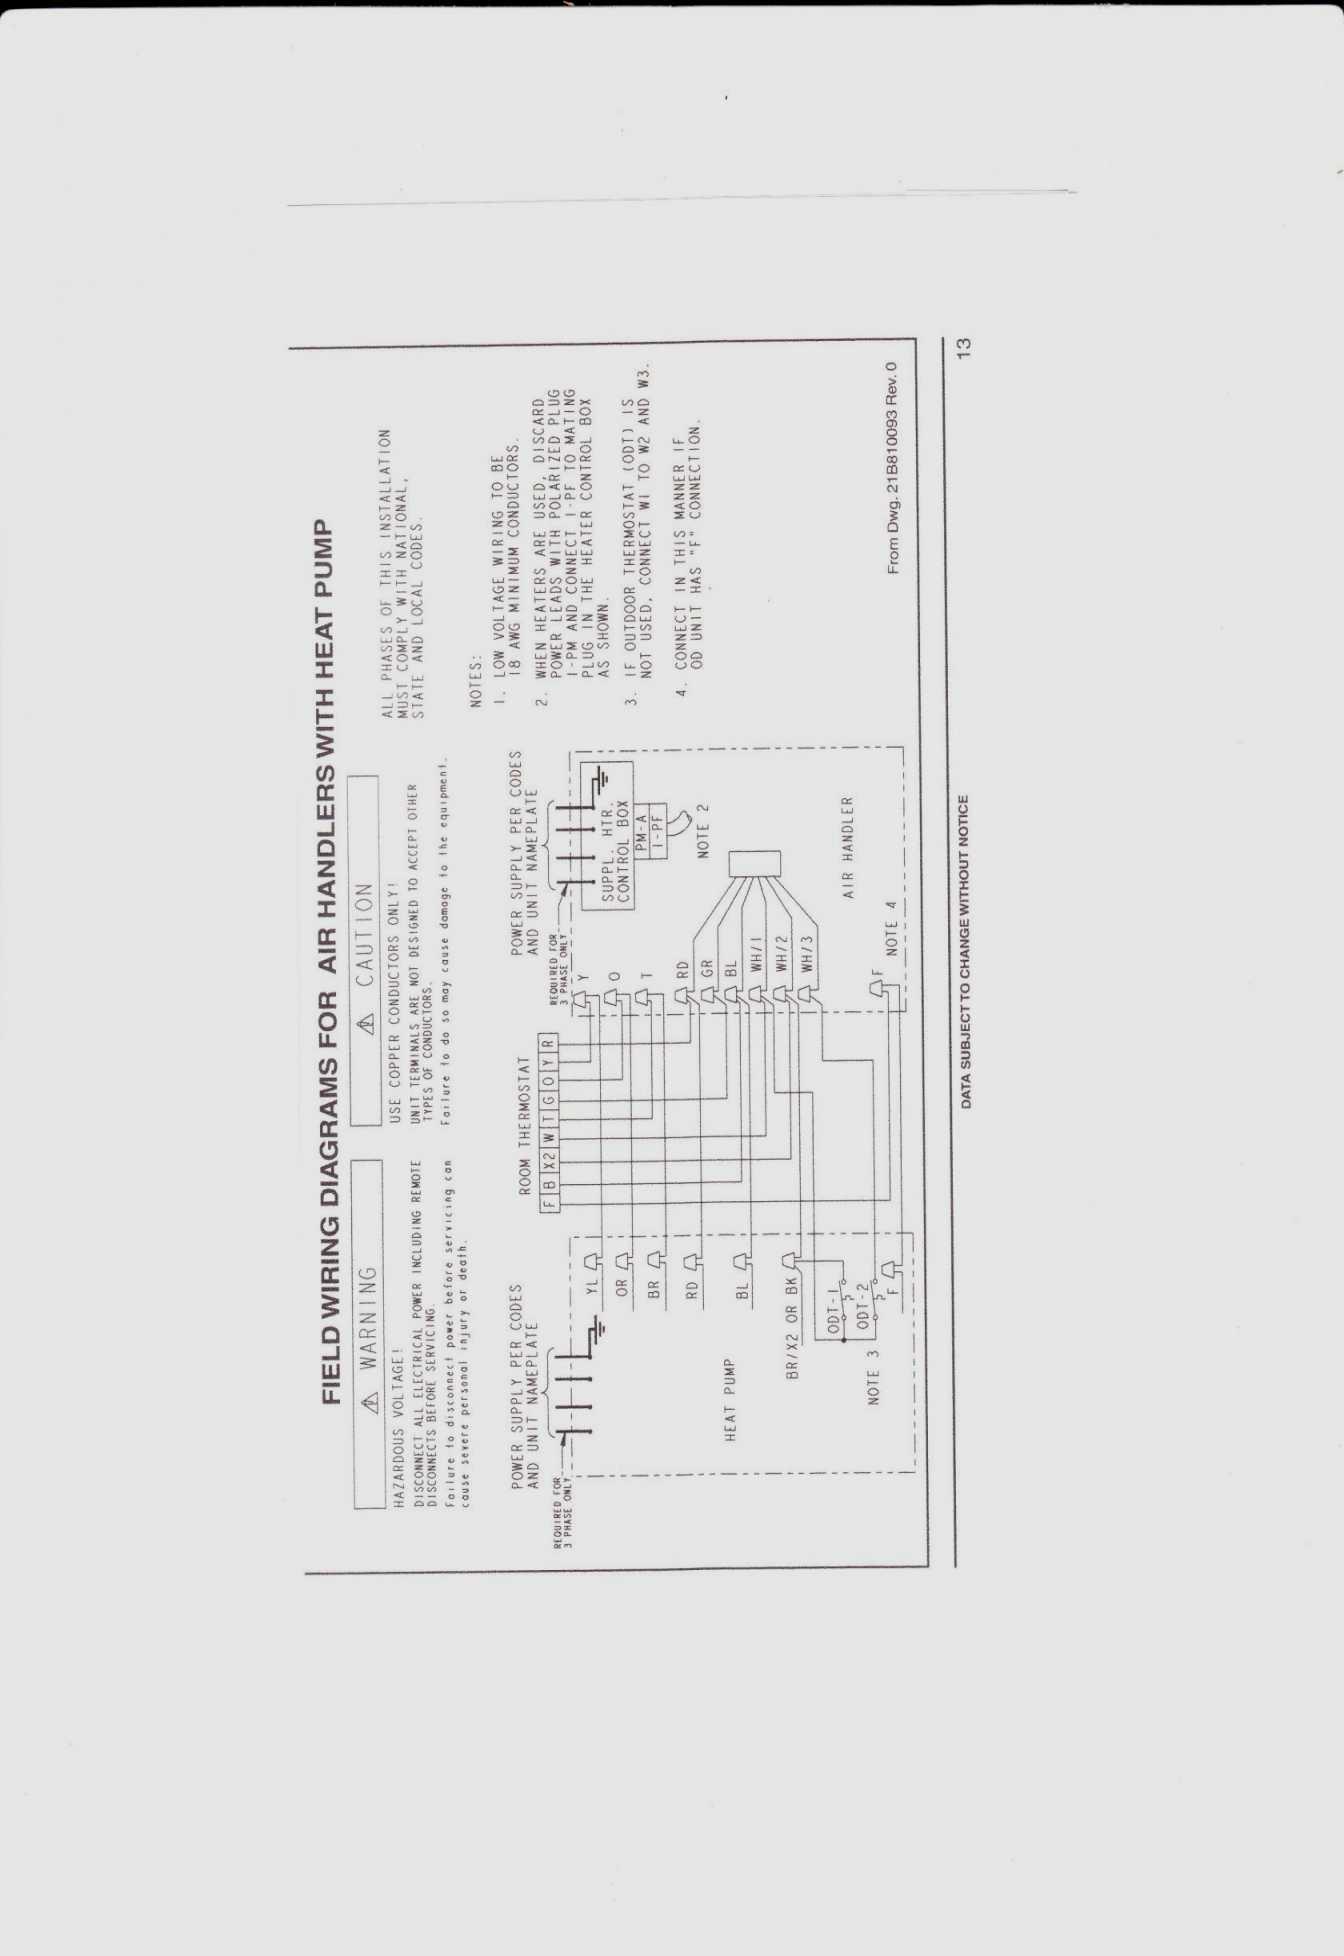 Nema 6 20r Wiring Wiring Diagram